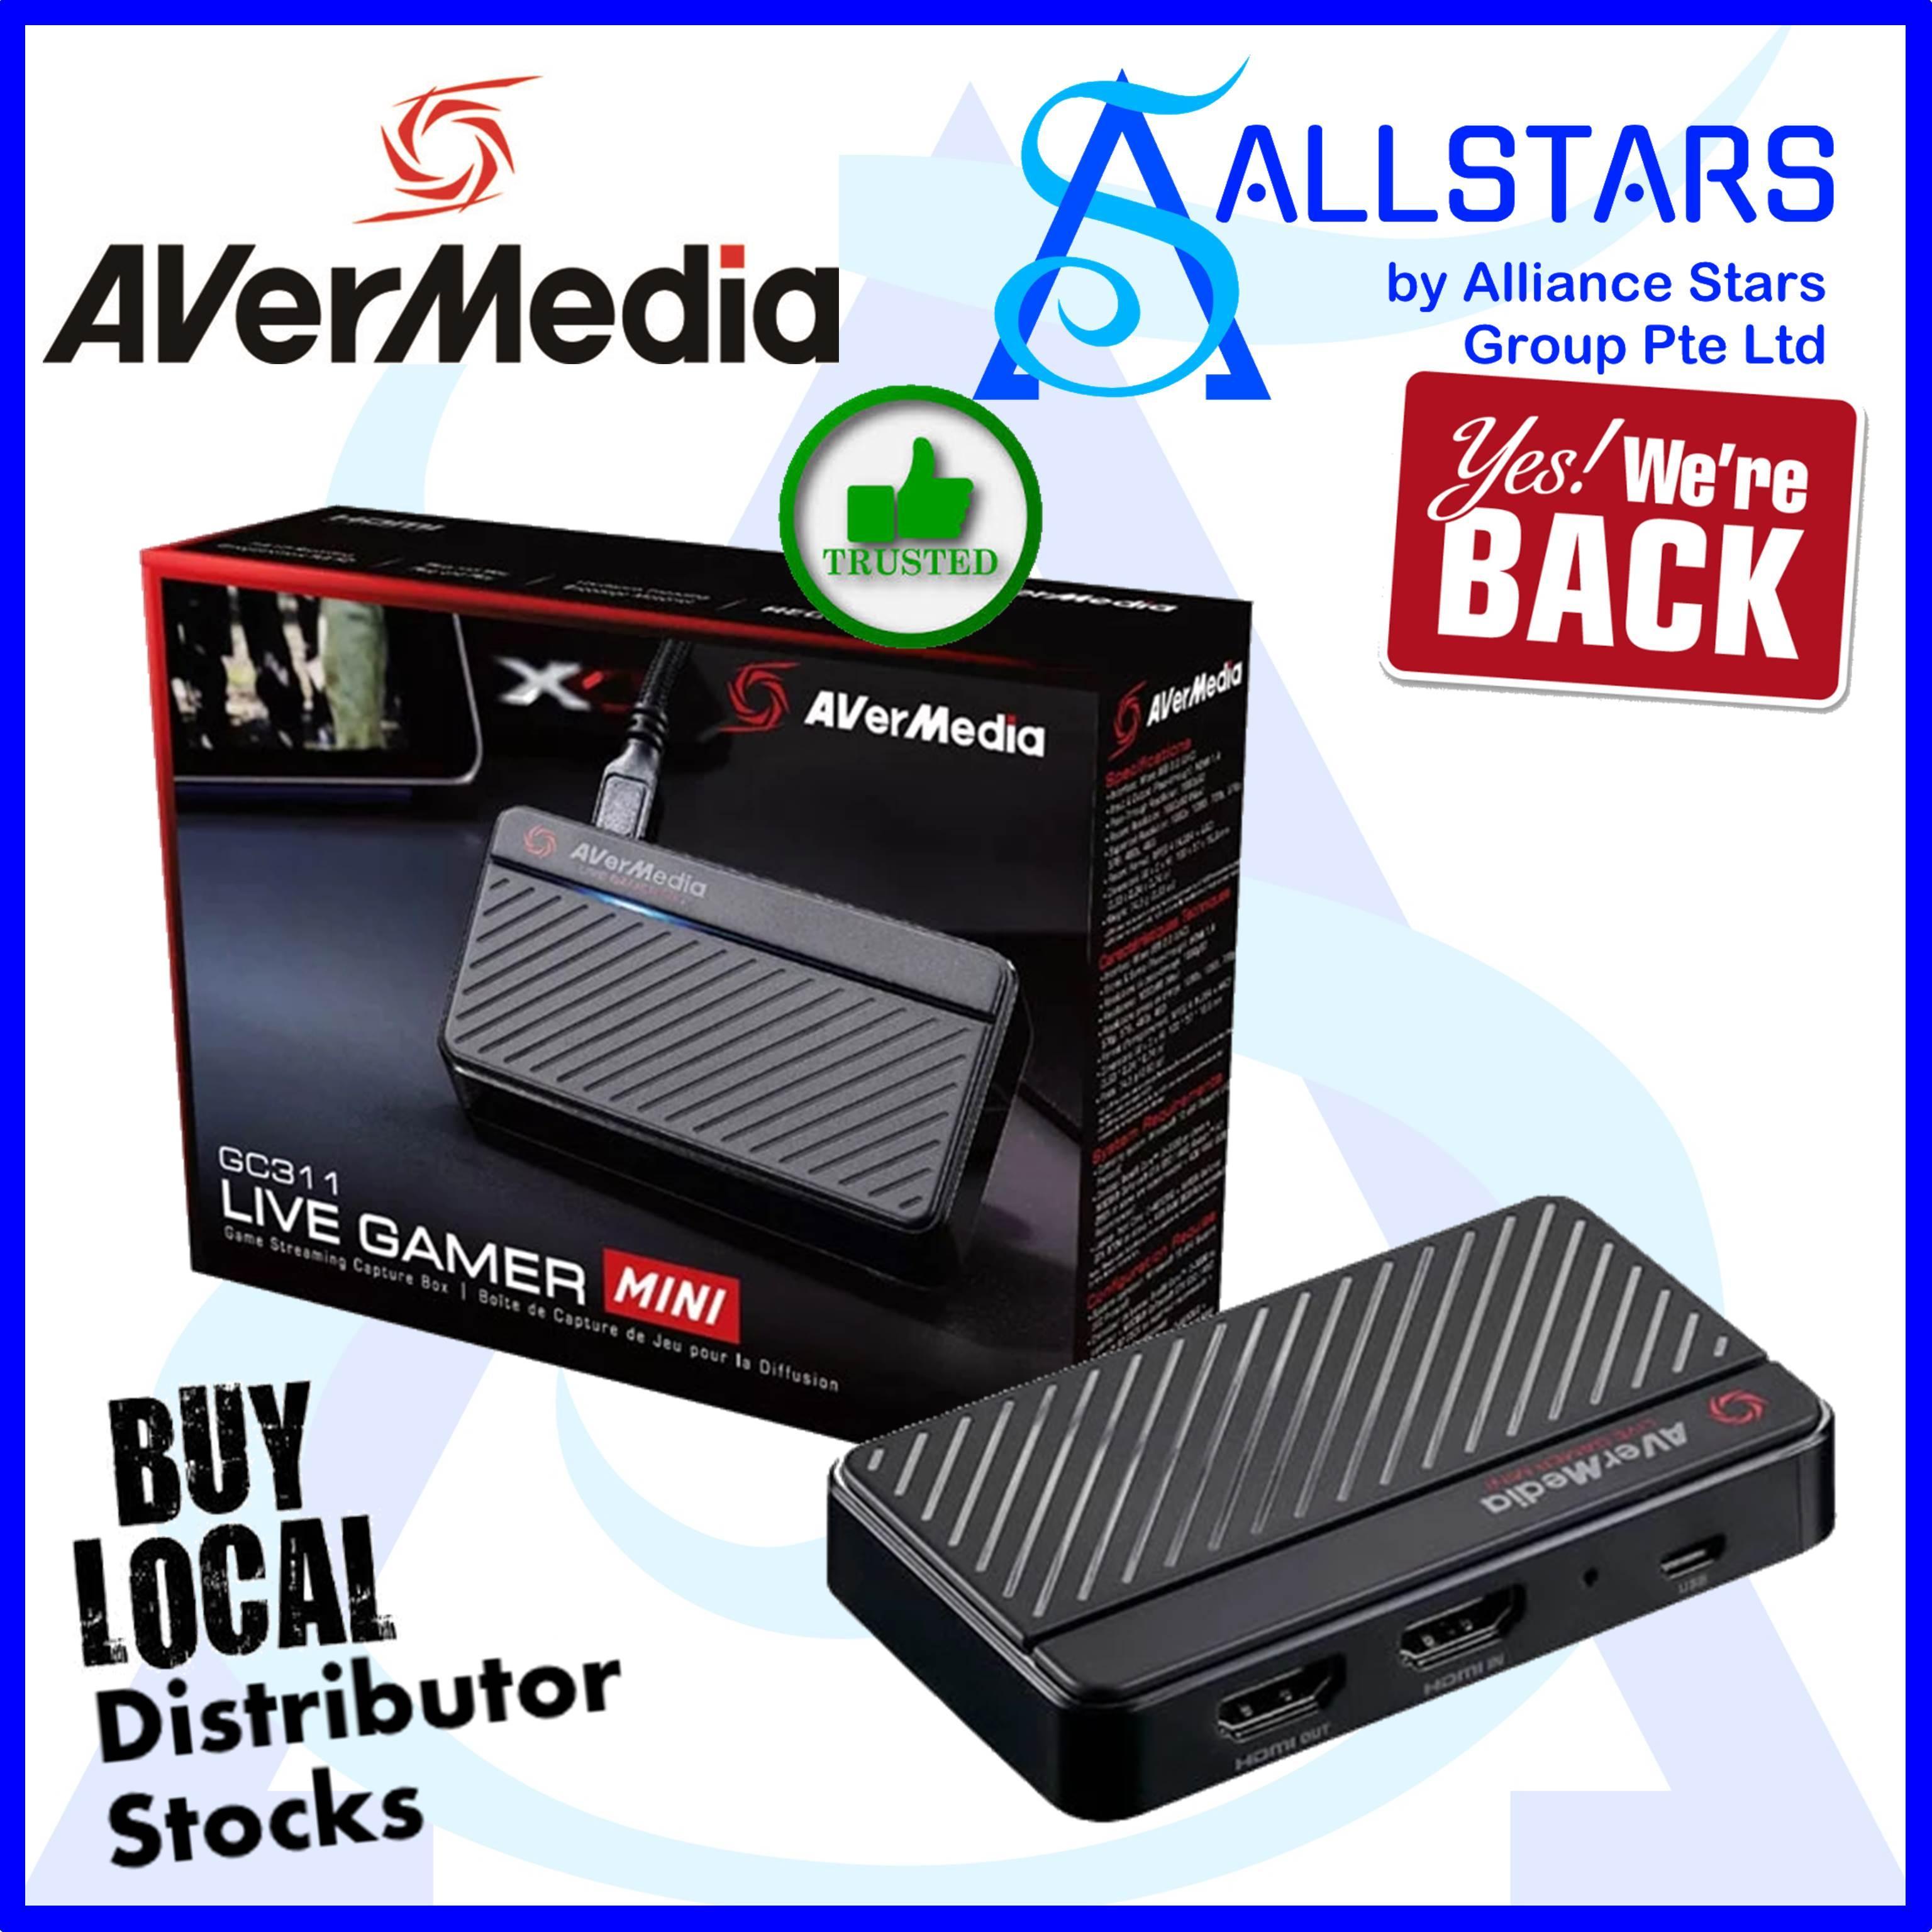 (ALLSTARS : We are Back PROMO) AVERMEDIA GC311 LIVE GAMER MINI Game Streaming Capture Box (Warranty 1year with Local Distributor Avertek)